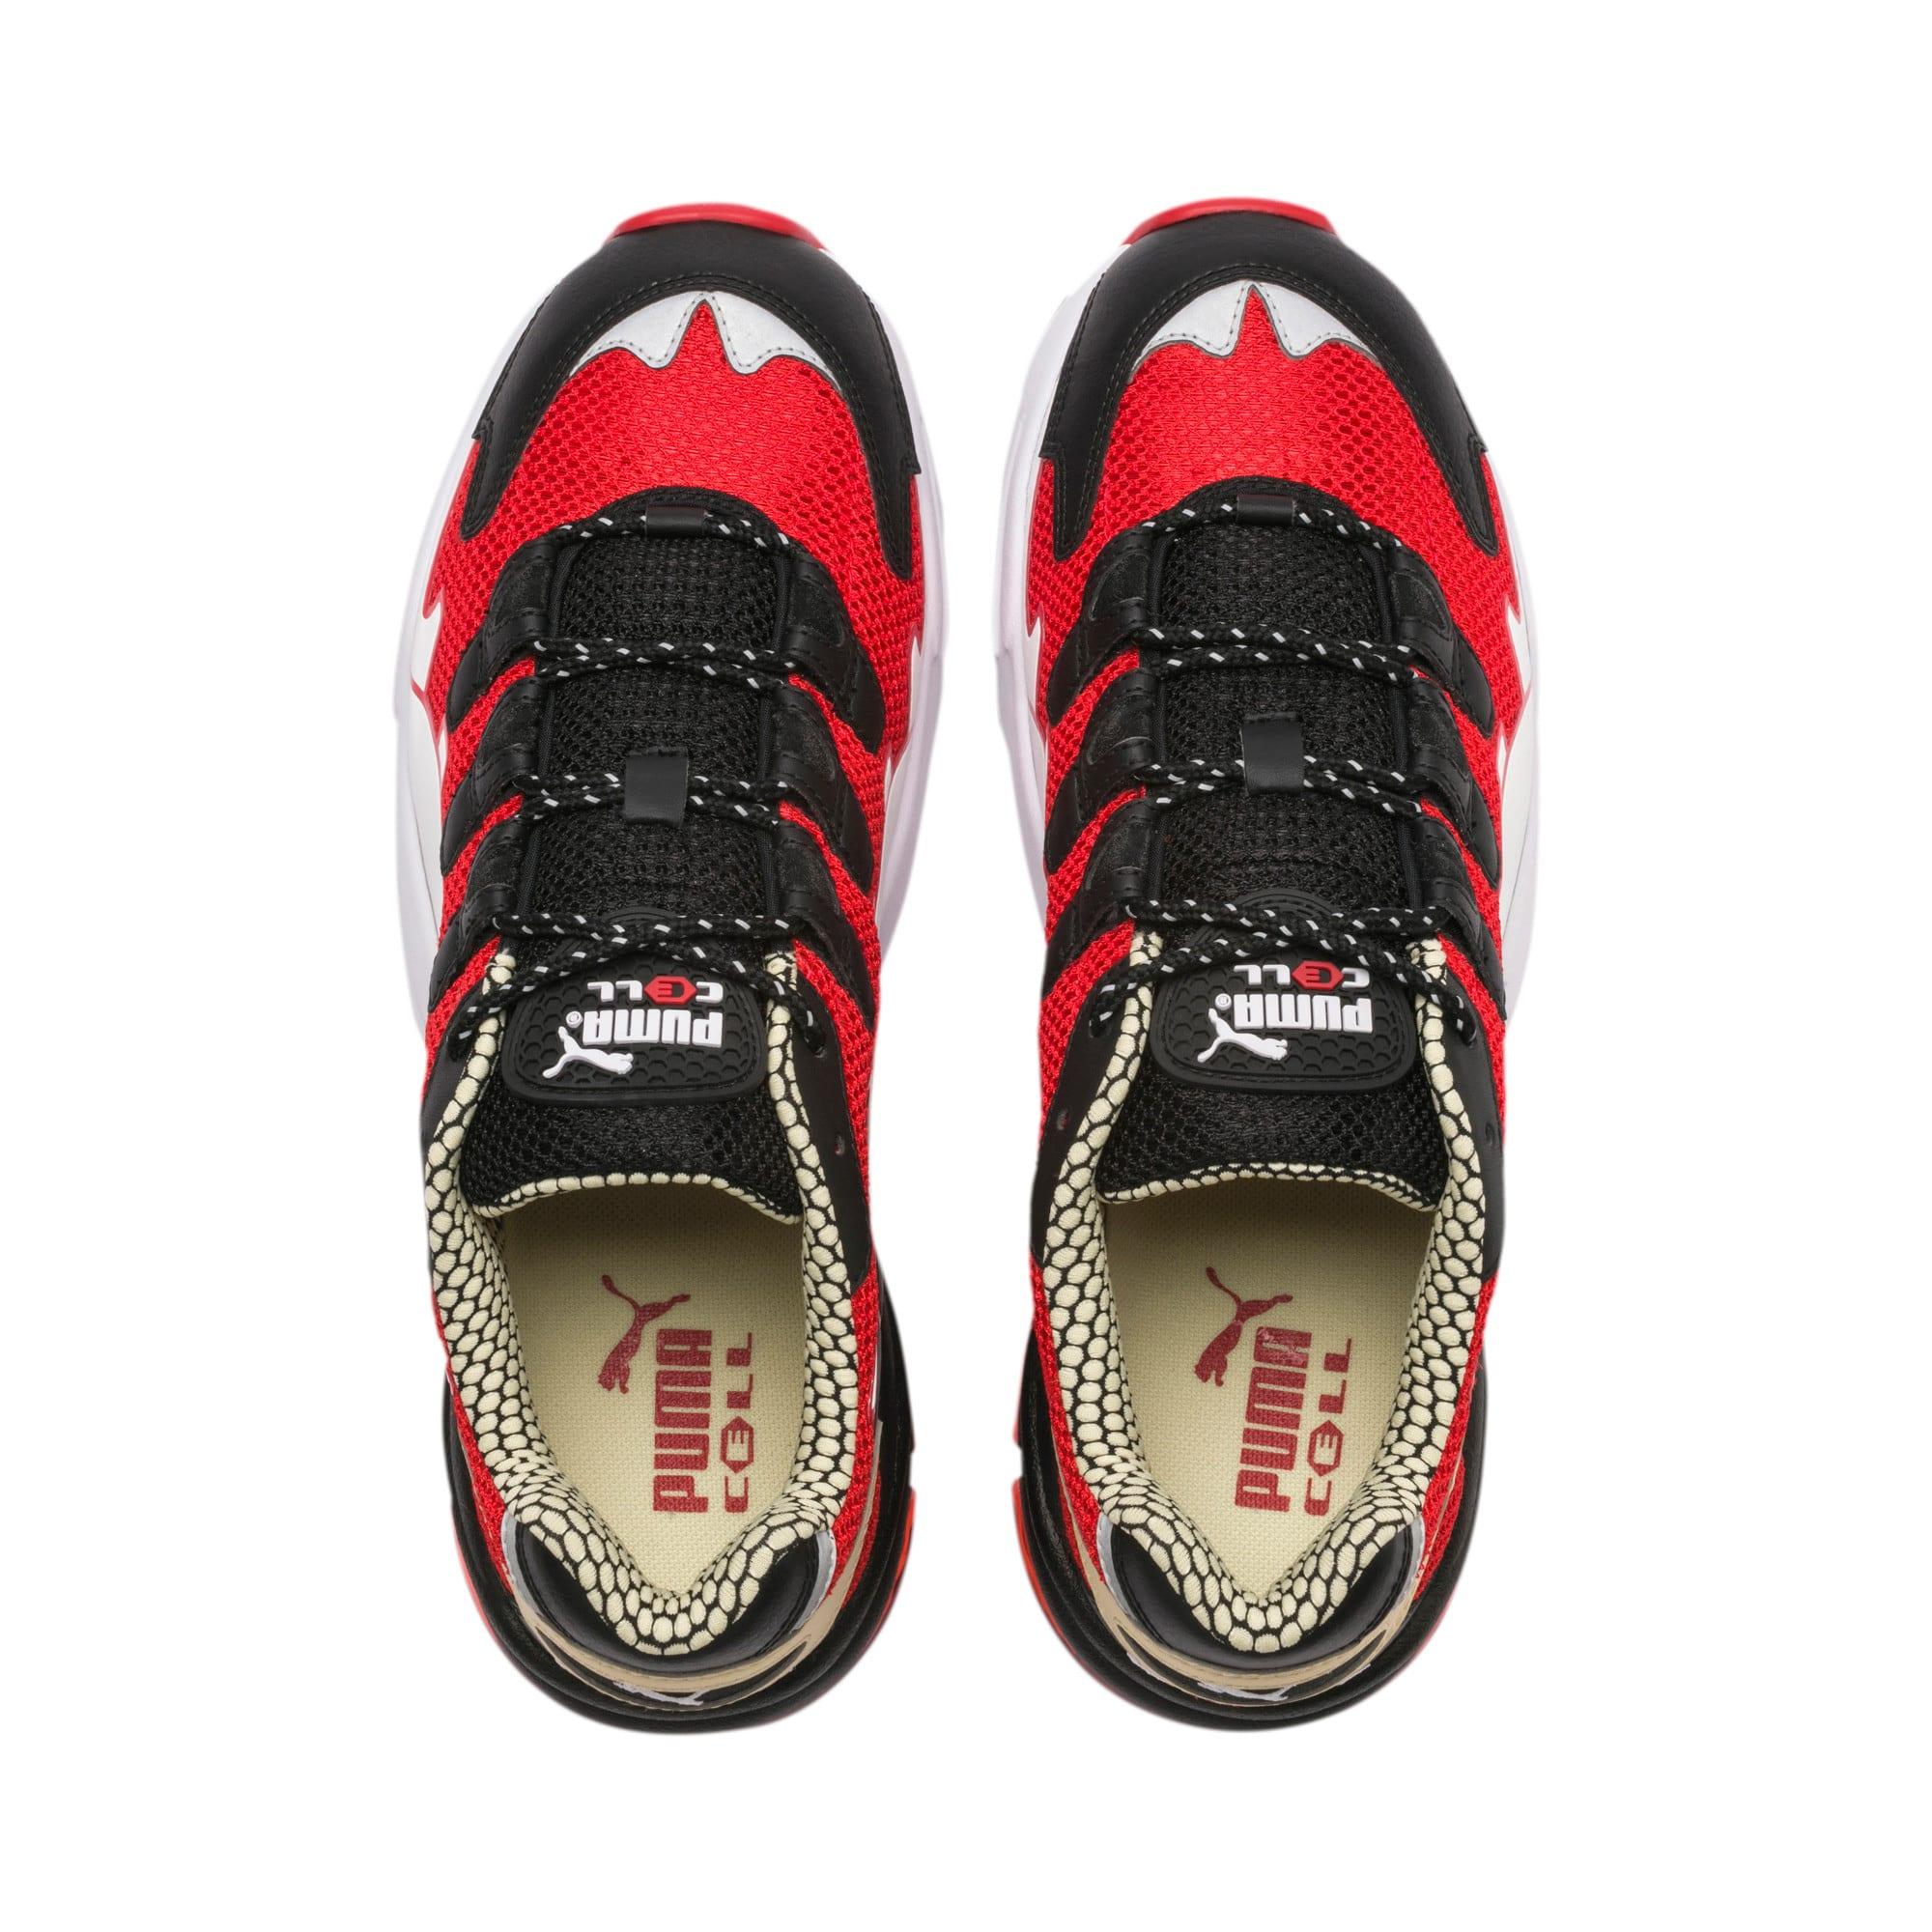 Thumbnail 7 of CELL Alien Kotto Sneakers, High Risk Red-Puma Black, medium